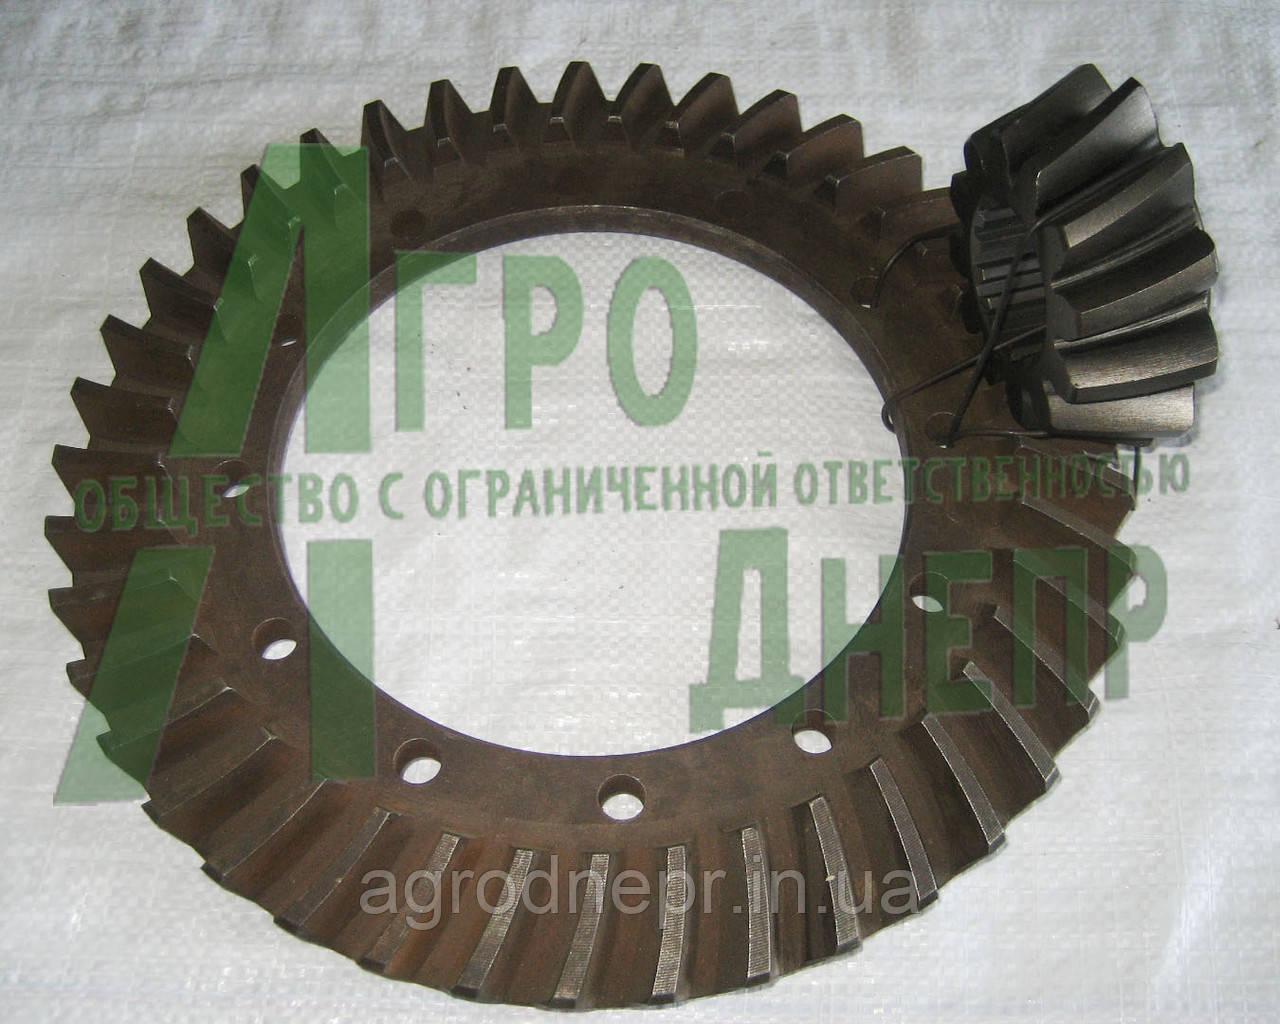 Комплект шестерен (главная пара) МТЗ 50-2403014